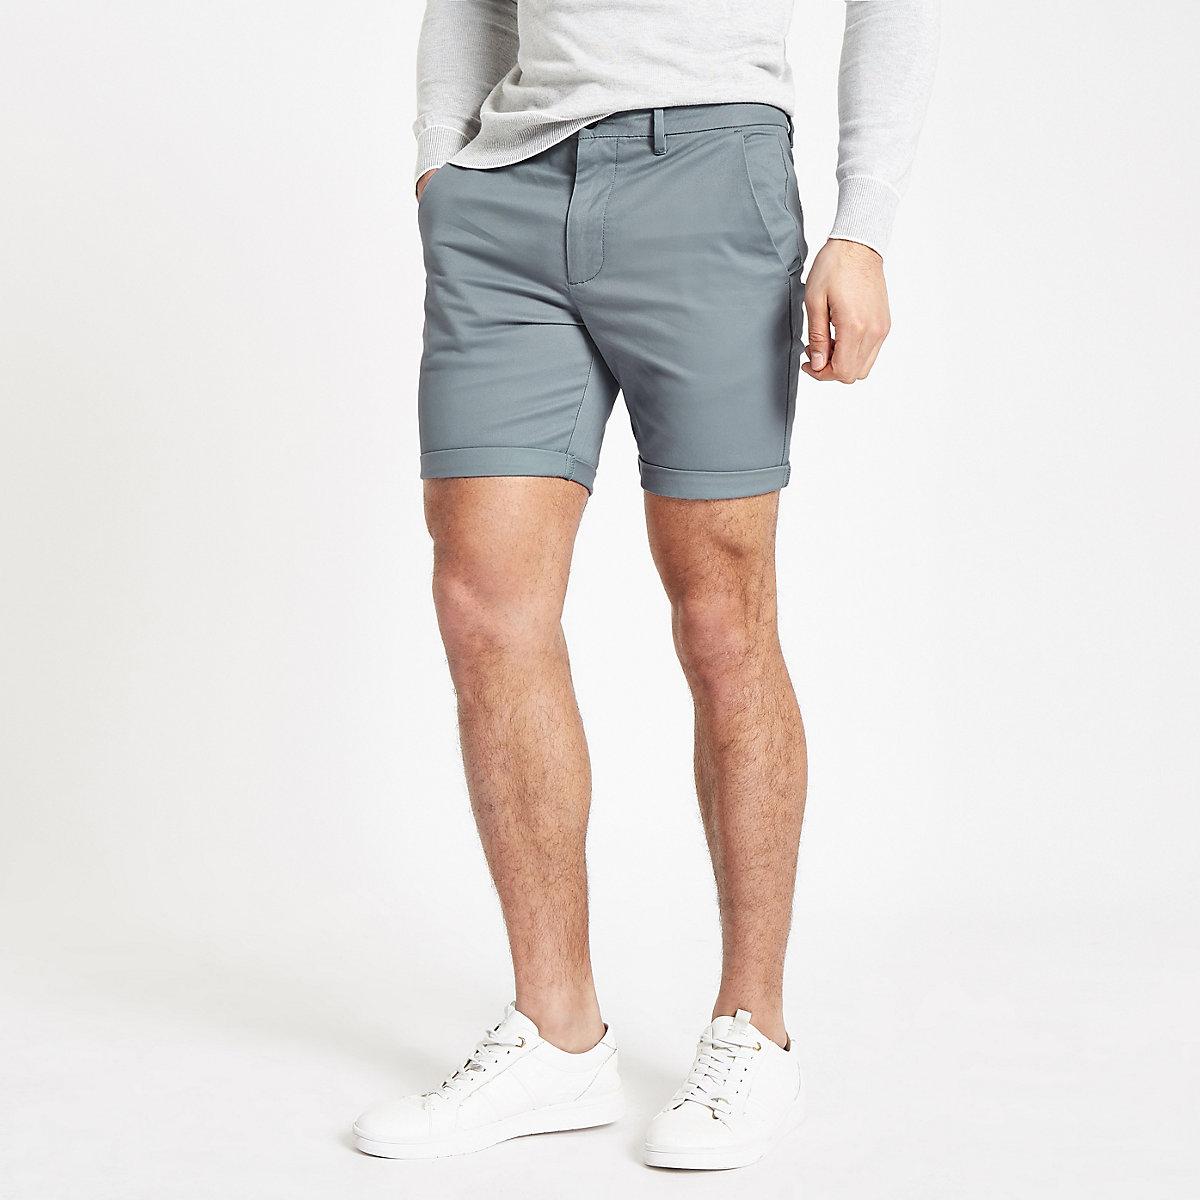 Blue skinny chino shorts